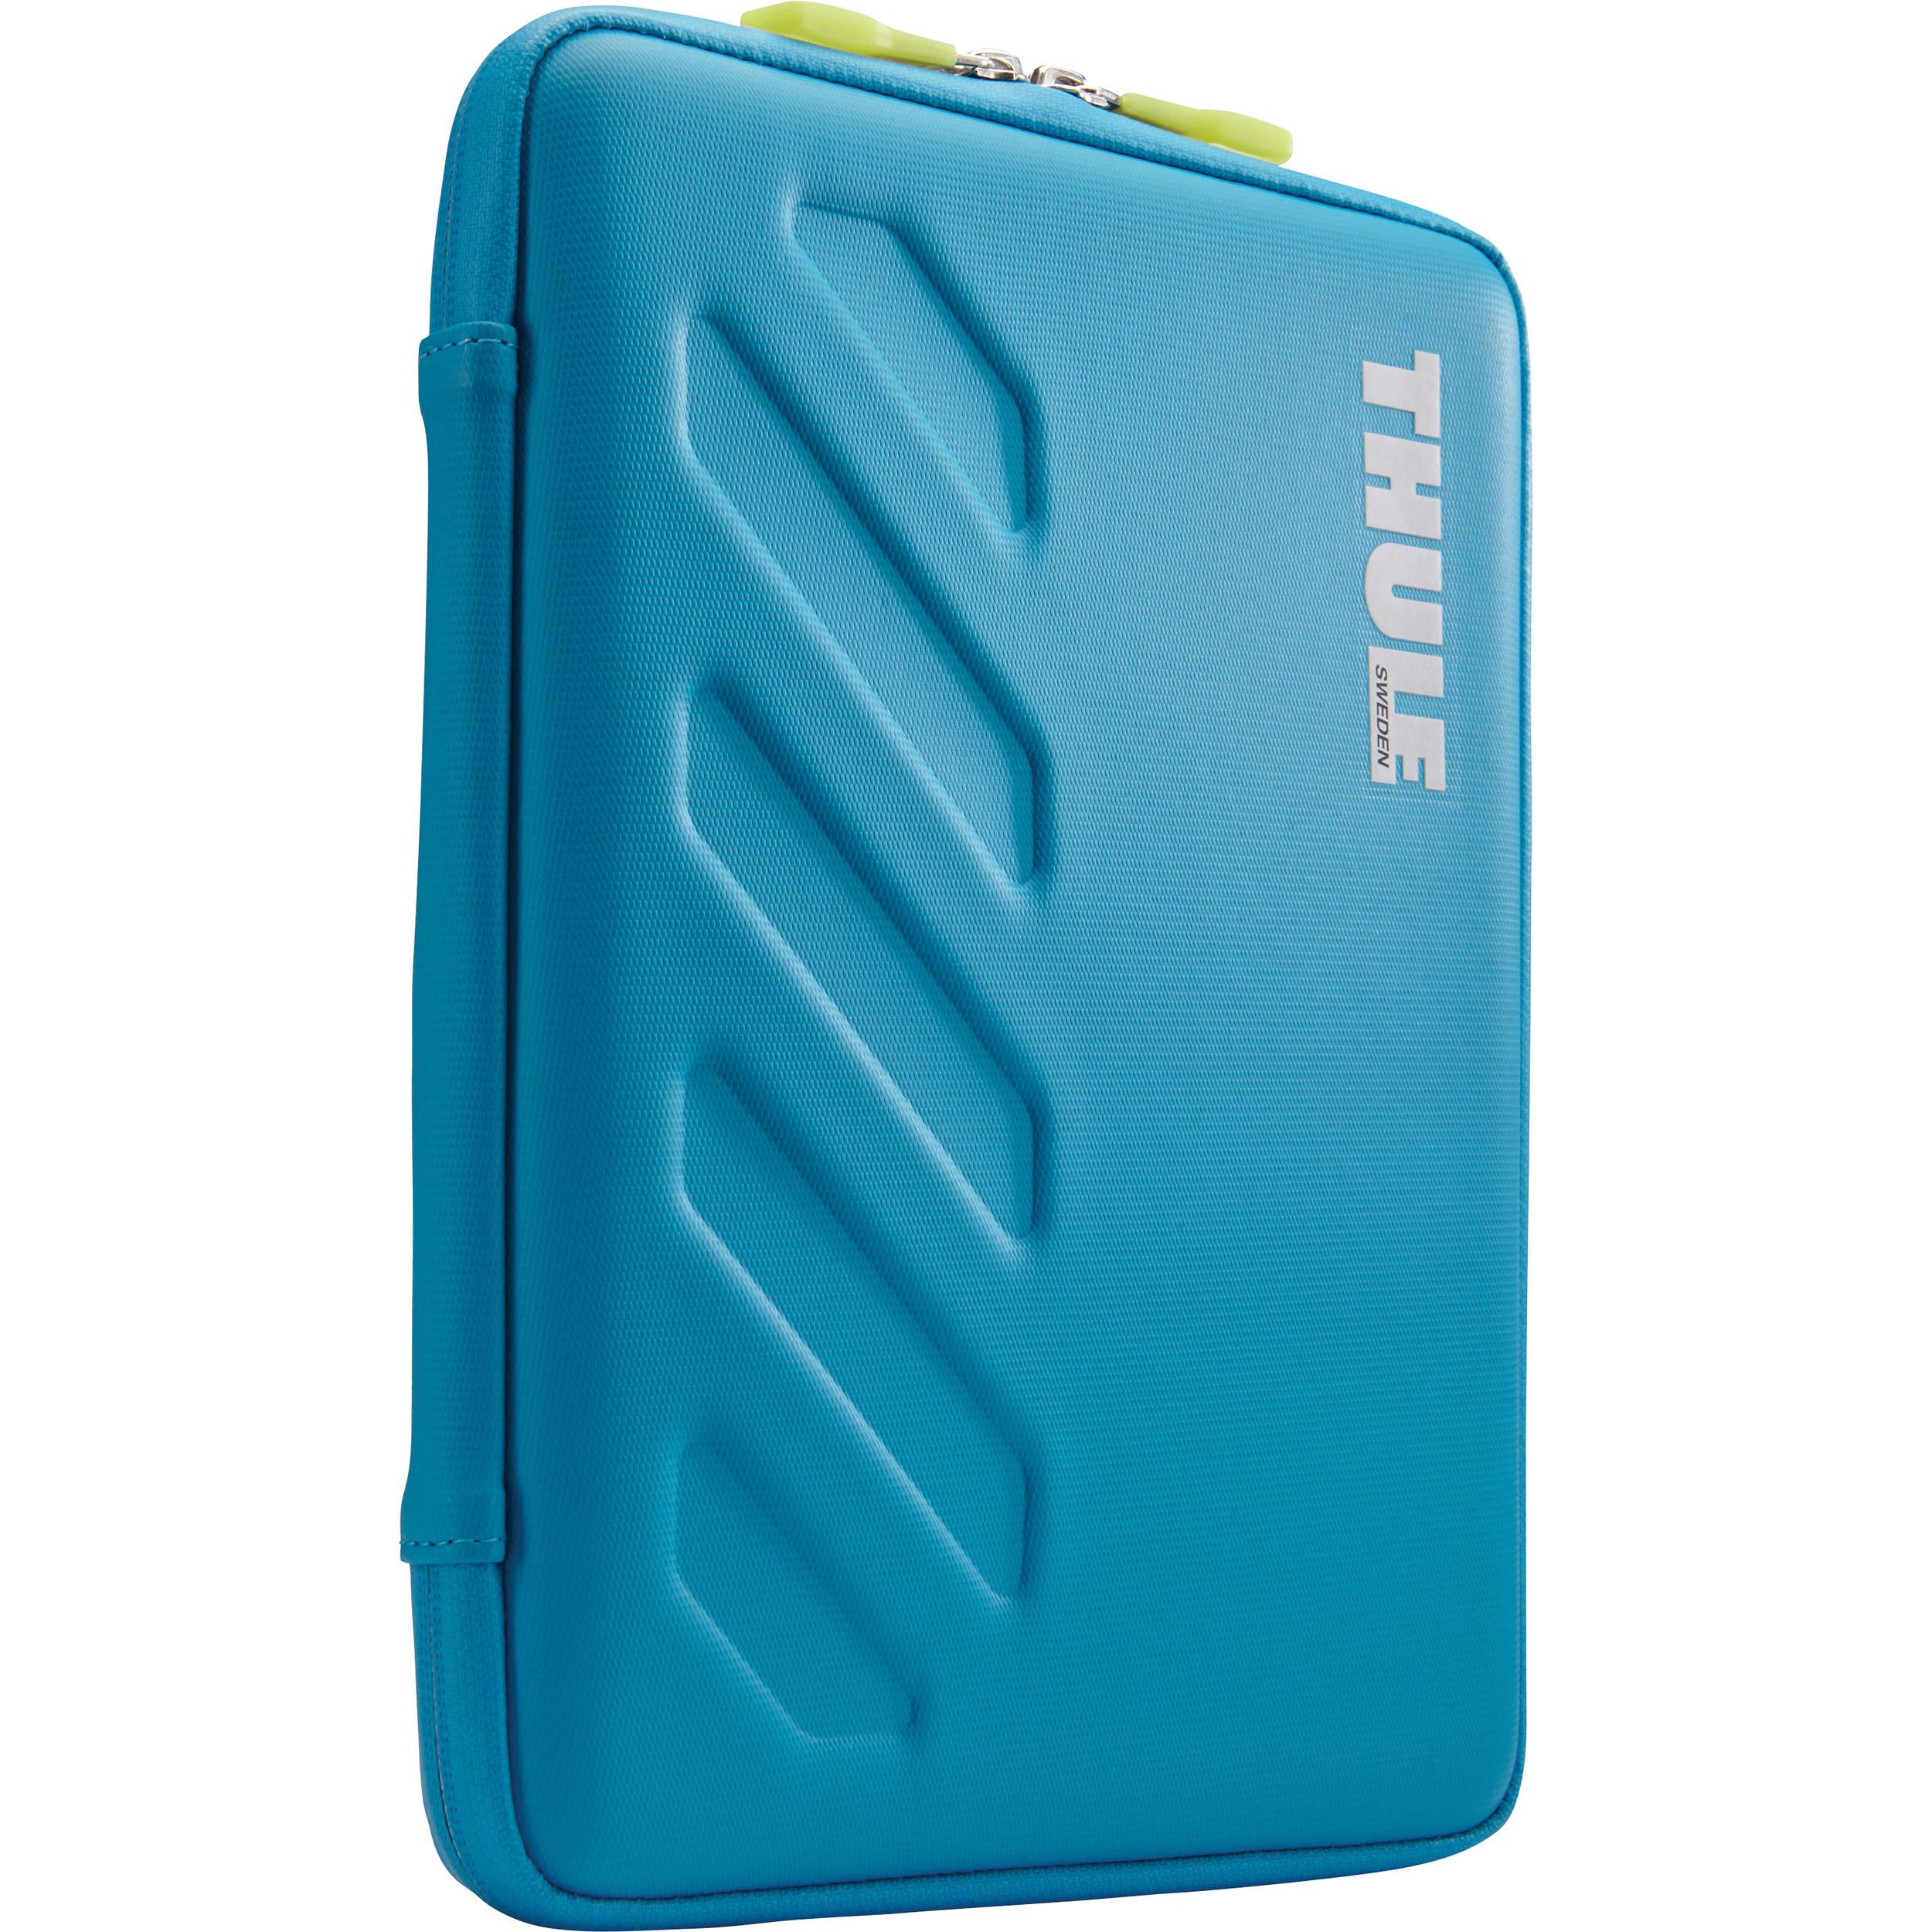 Thule Gauntlet 1 0 Sleeve for iPad Air (Blue)